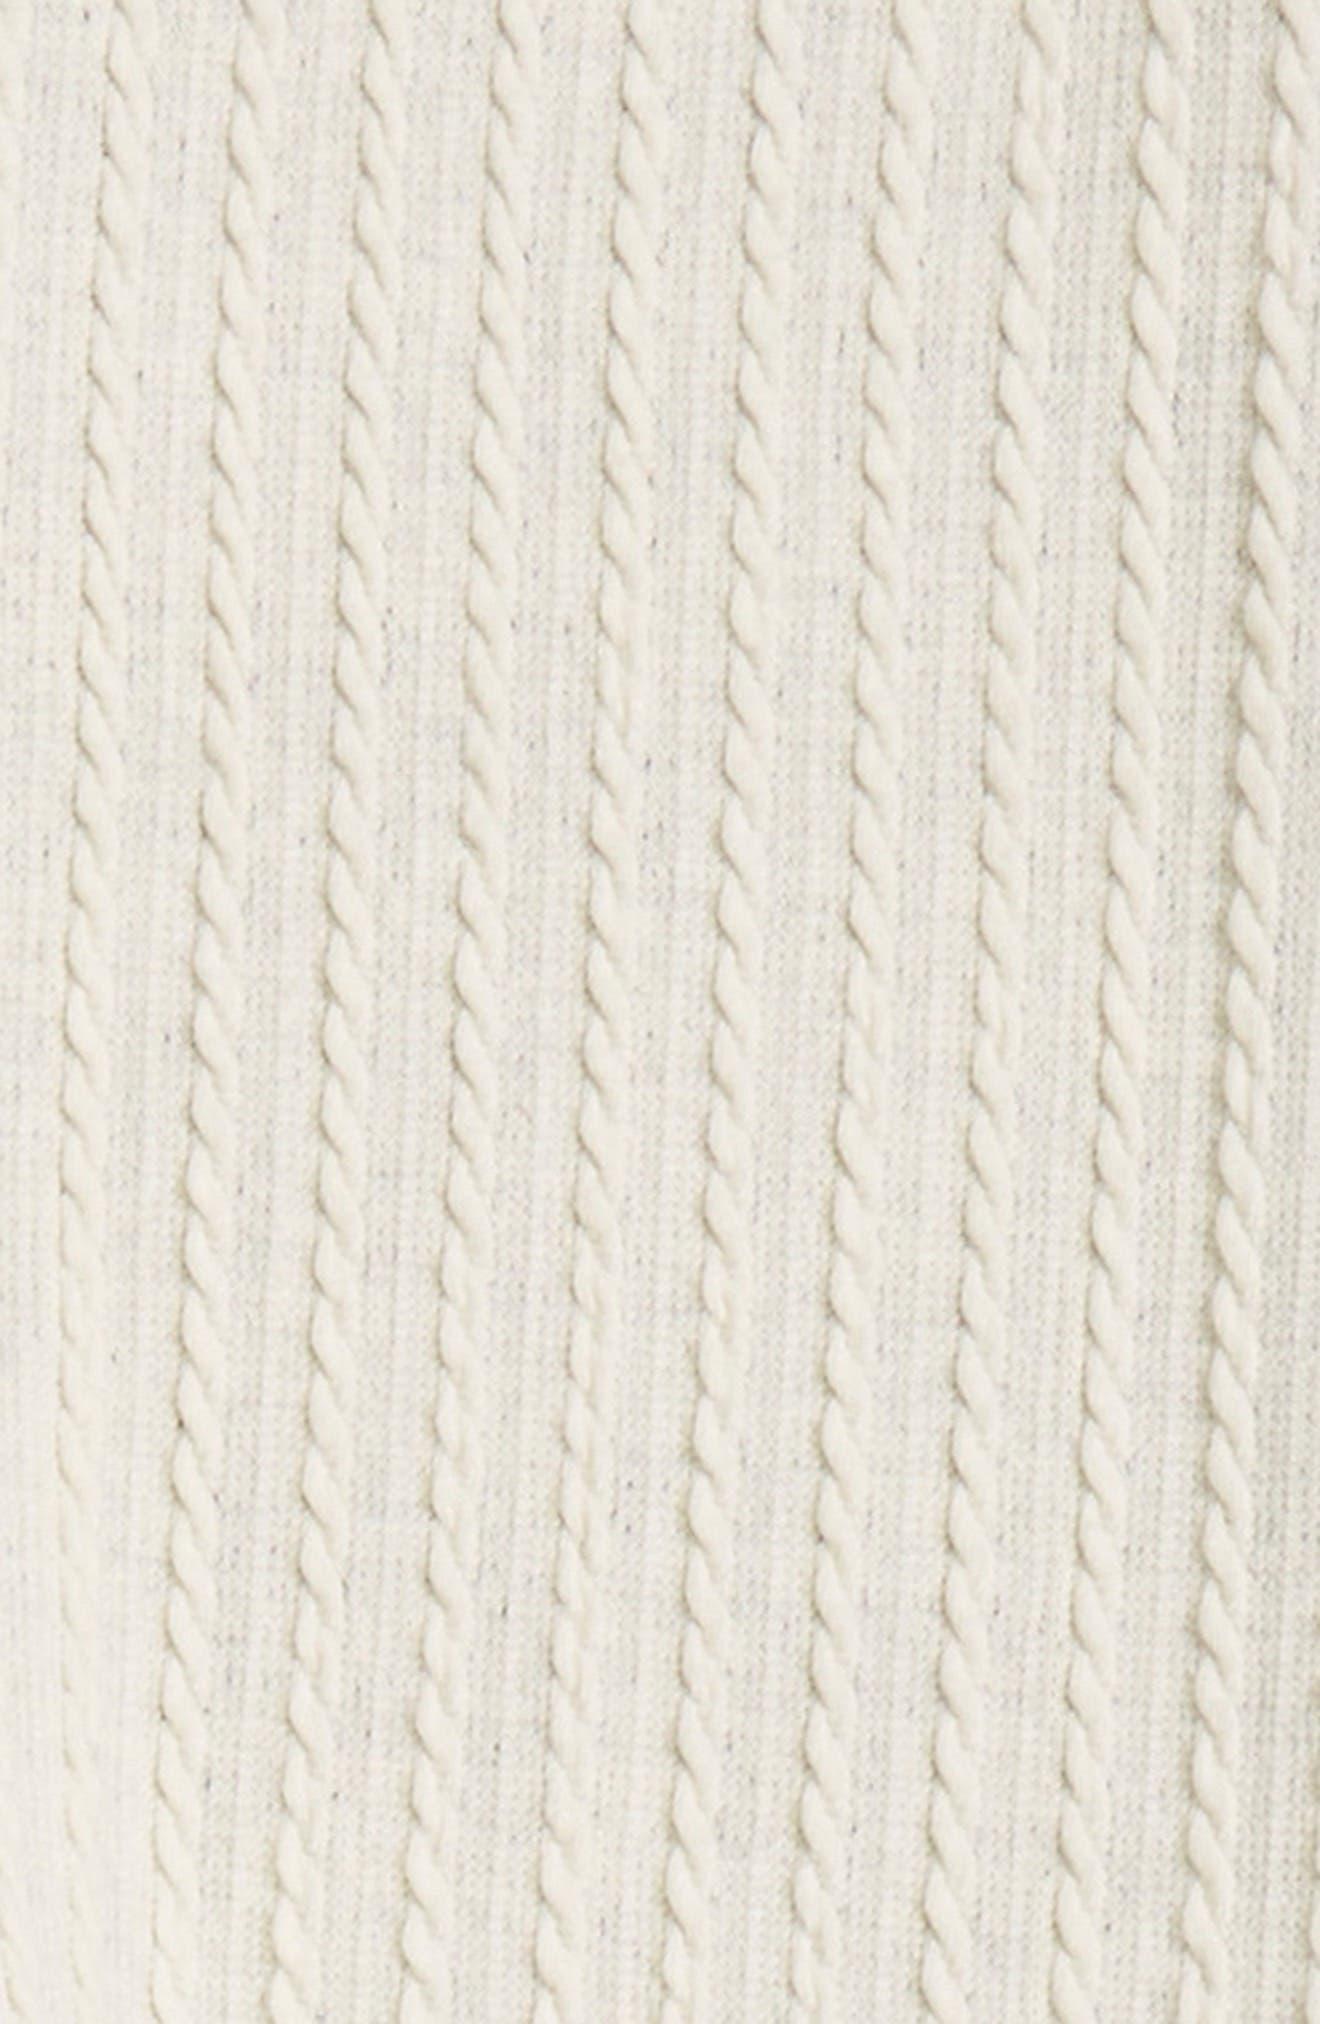 Cable Knit Leggings,                             Alternate thumbnail 2, color,                             Ivory Egret